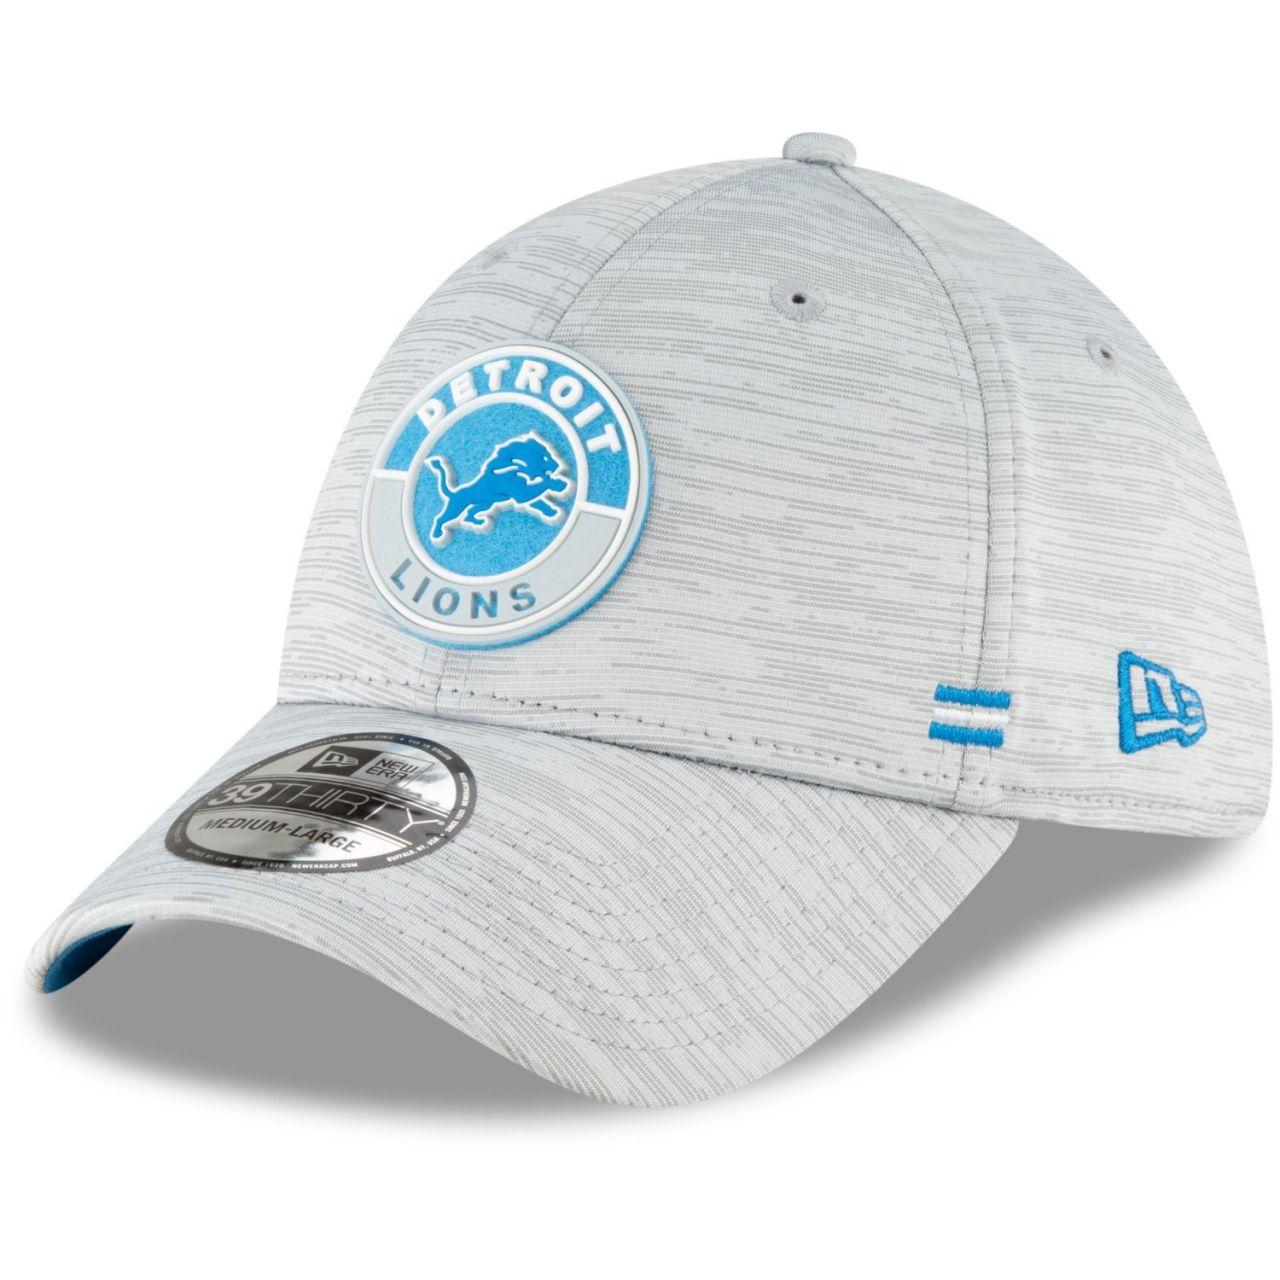 amfoo - New Era 39Thirty Cap - SIDELINE 2020 Detroit Lions